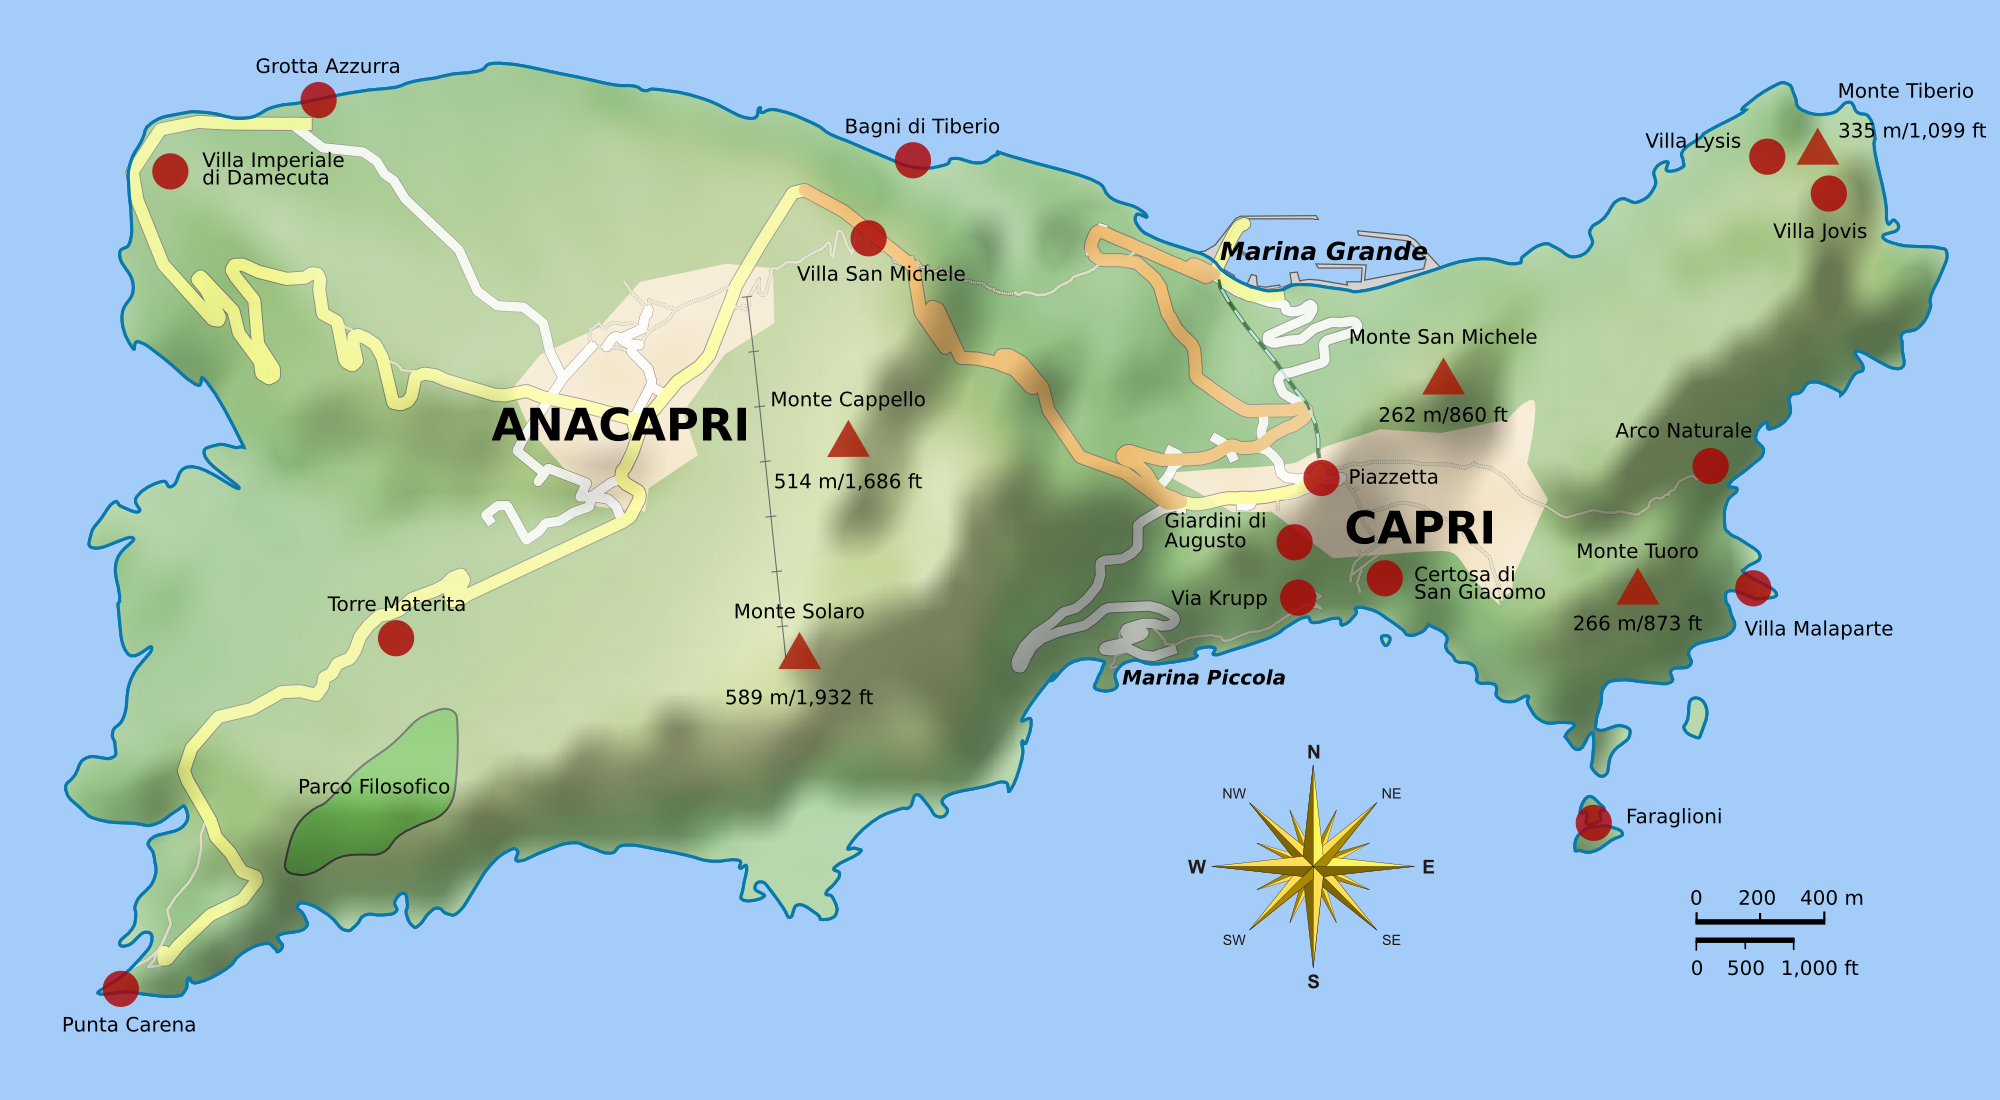 Datei:Capri sights.png – Wikipedia on